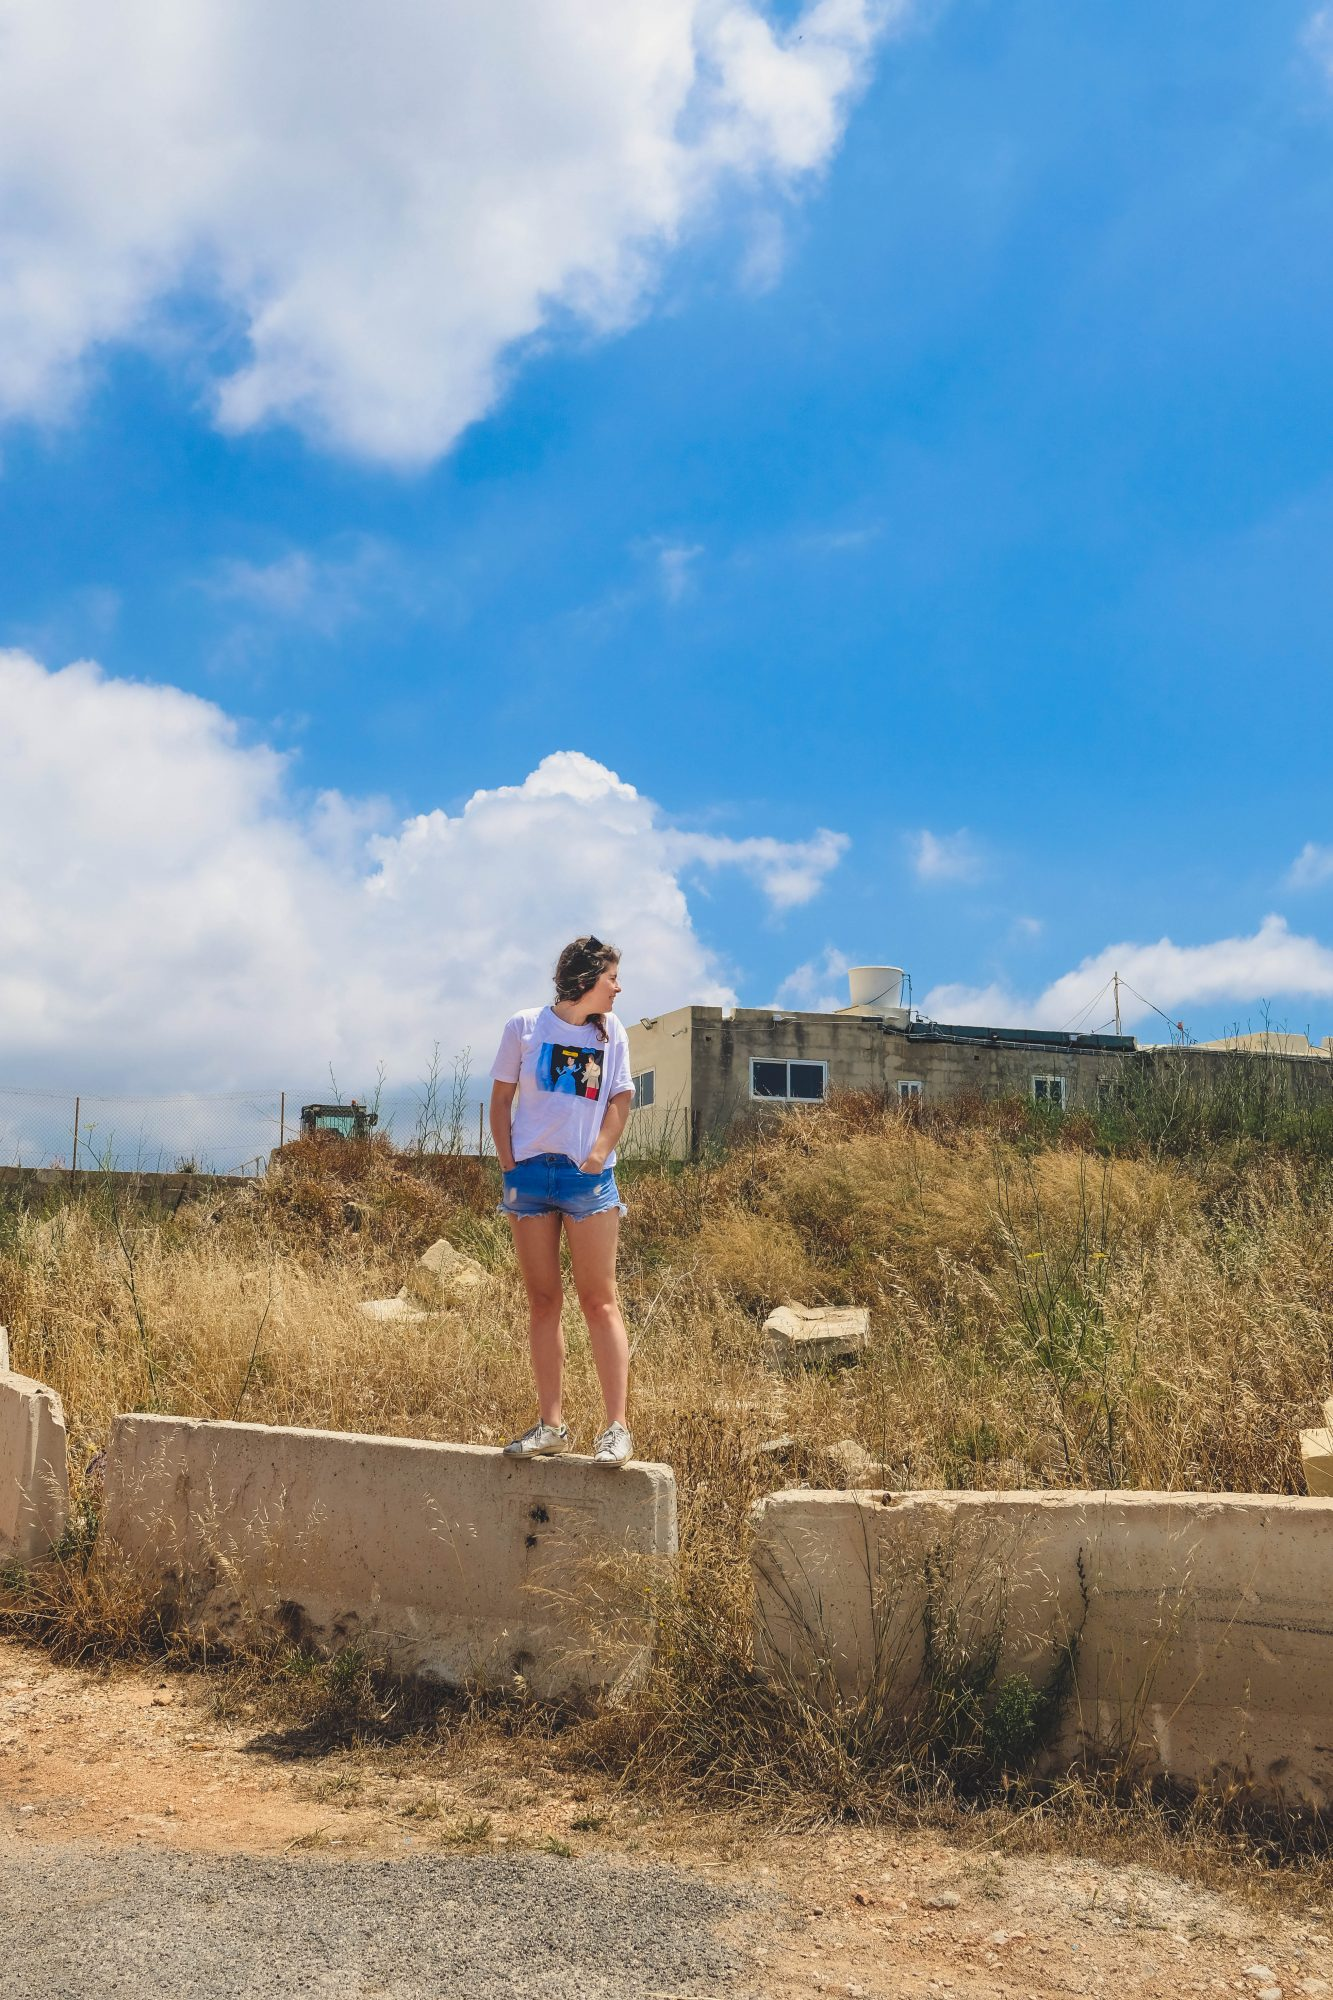 Halte sur la route - Malte